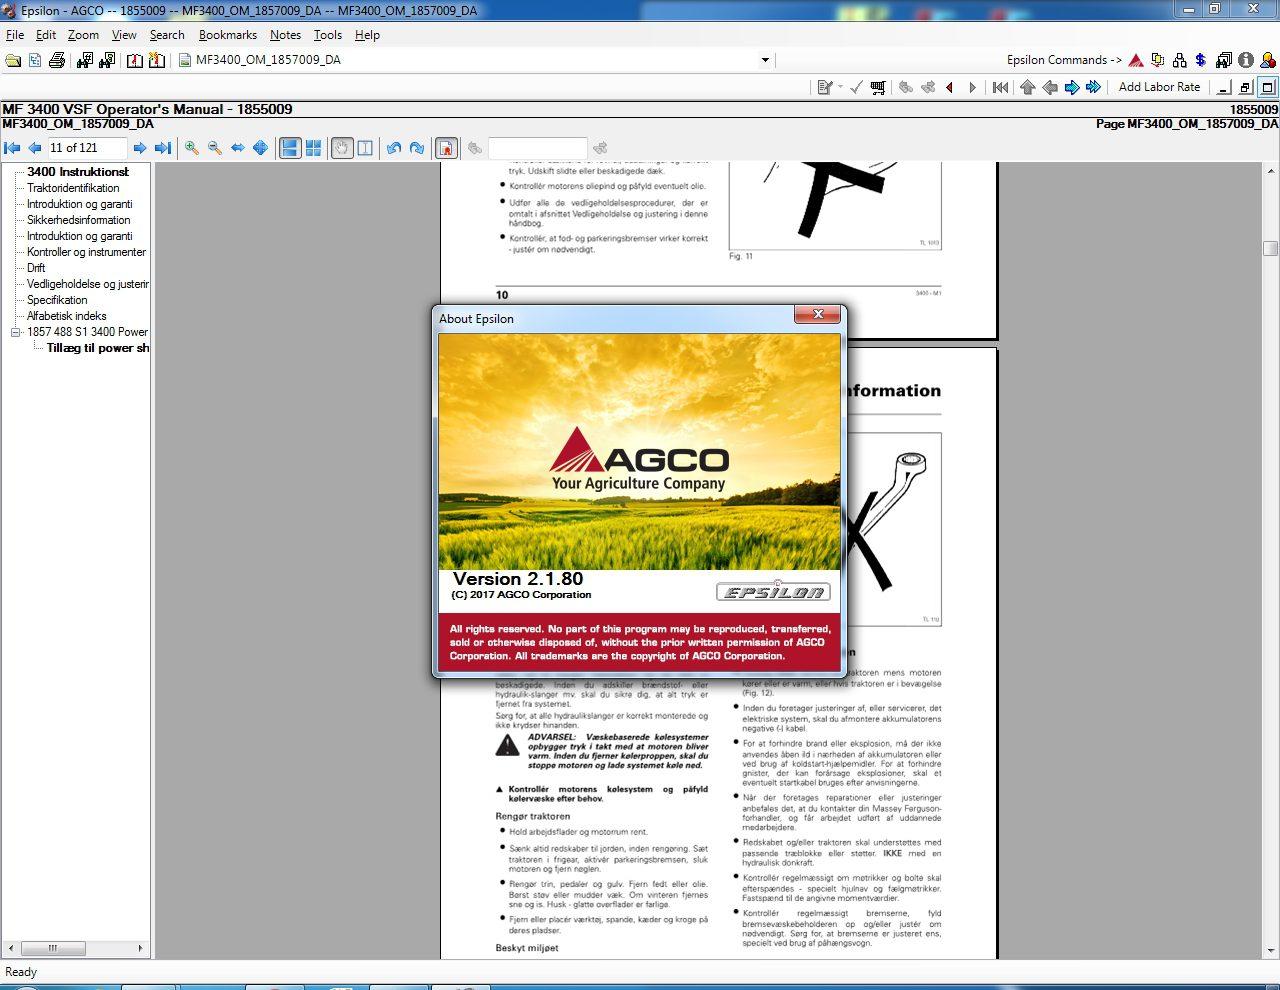 Massey_Ferguson_SA_AG_South_America_112019_Part_Book_Workshop_Service_Manuals_8